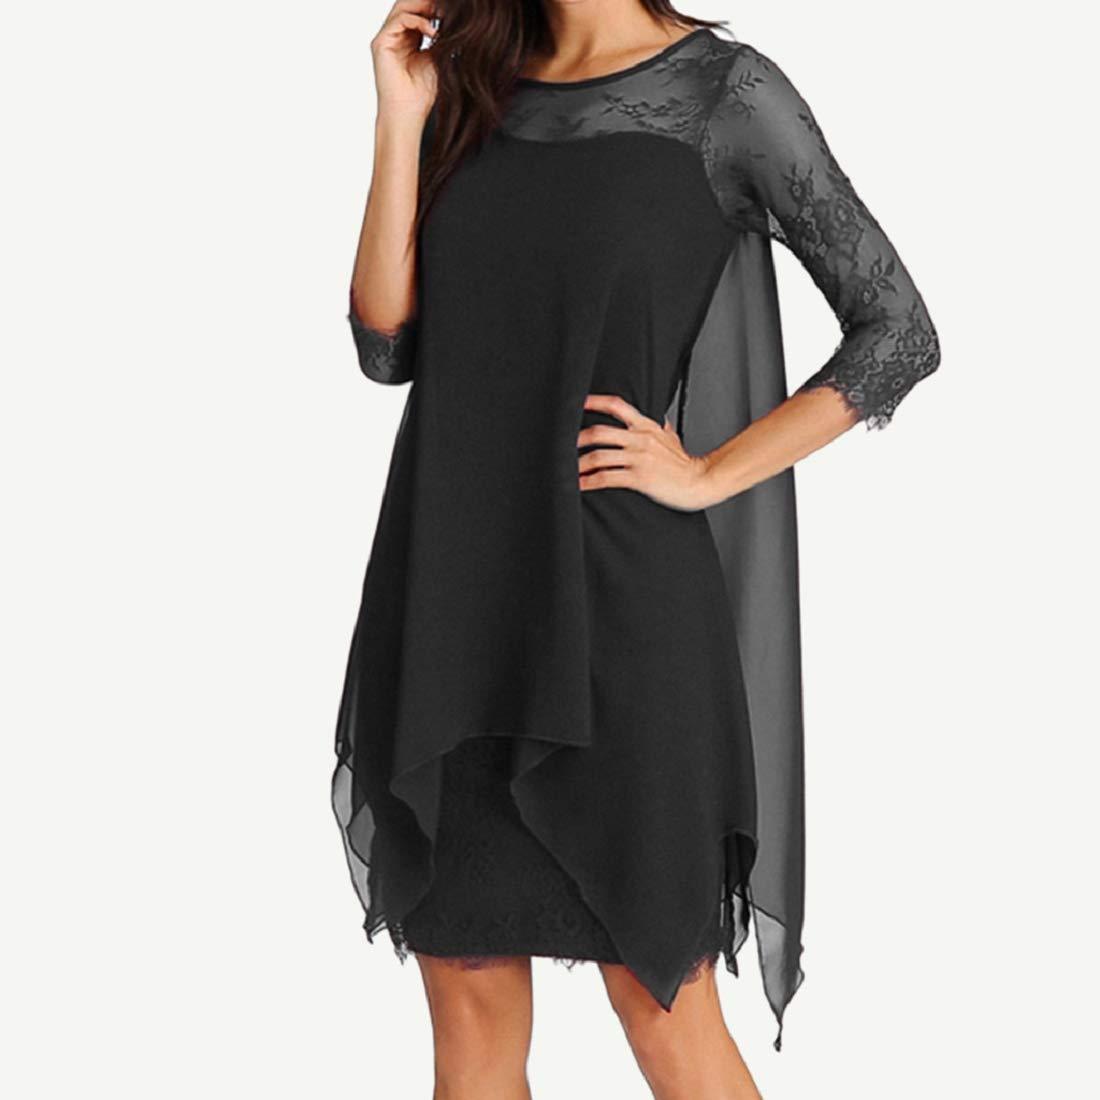 Bkolouuoe Women Chiffon Floral Lace Dress Long Sleeve Plus Size Overlay Solid Color Crew Neck Oversize Dress